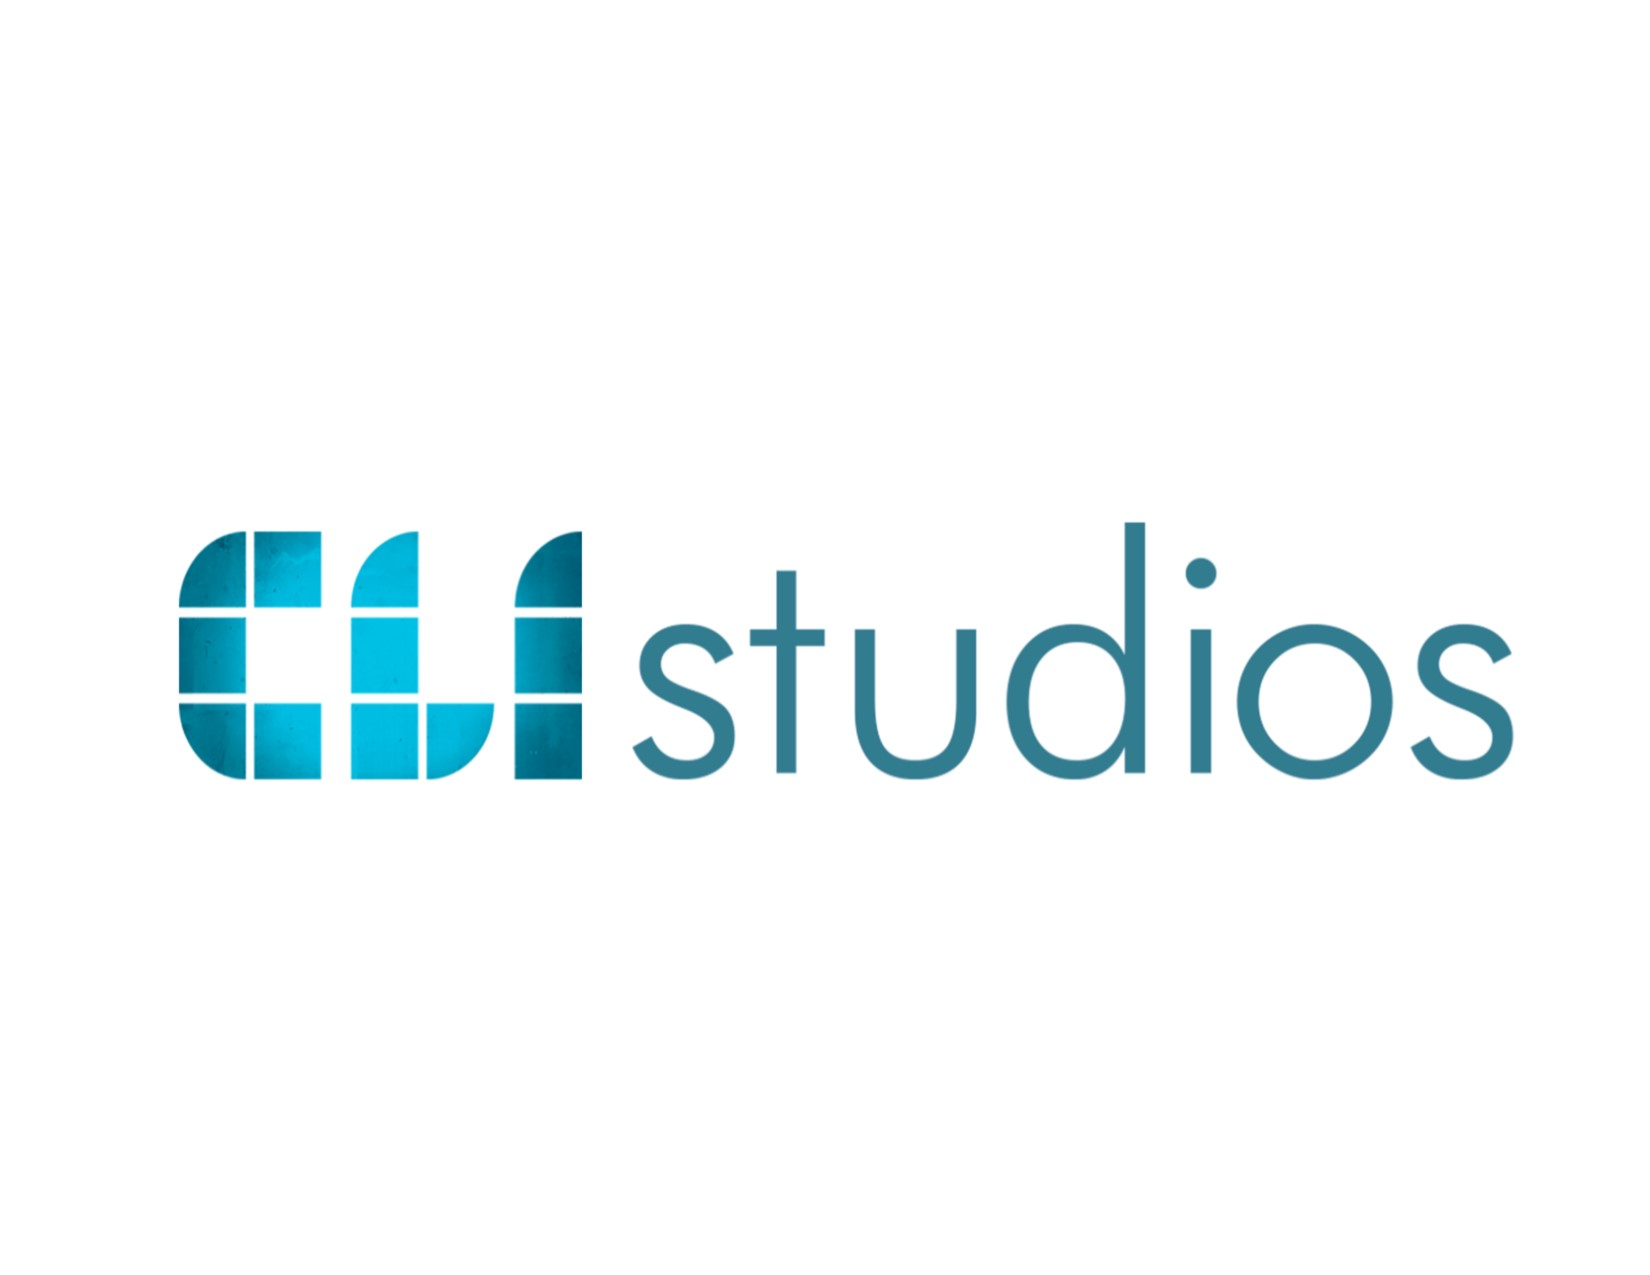 CLI Studios.jpg